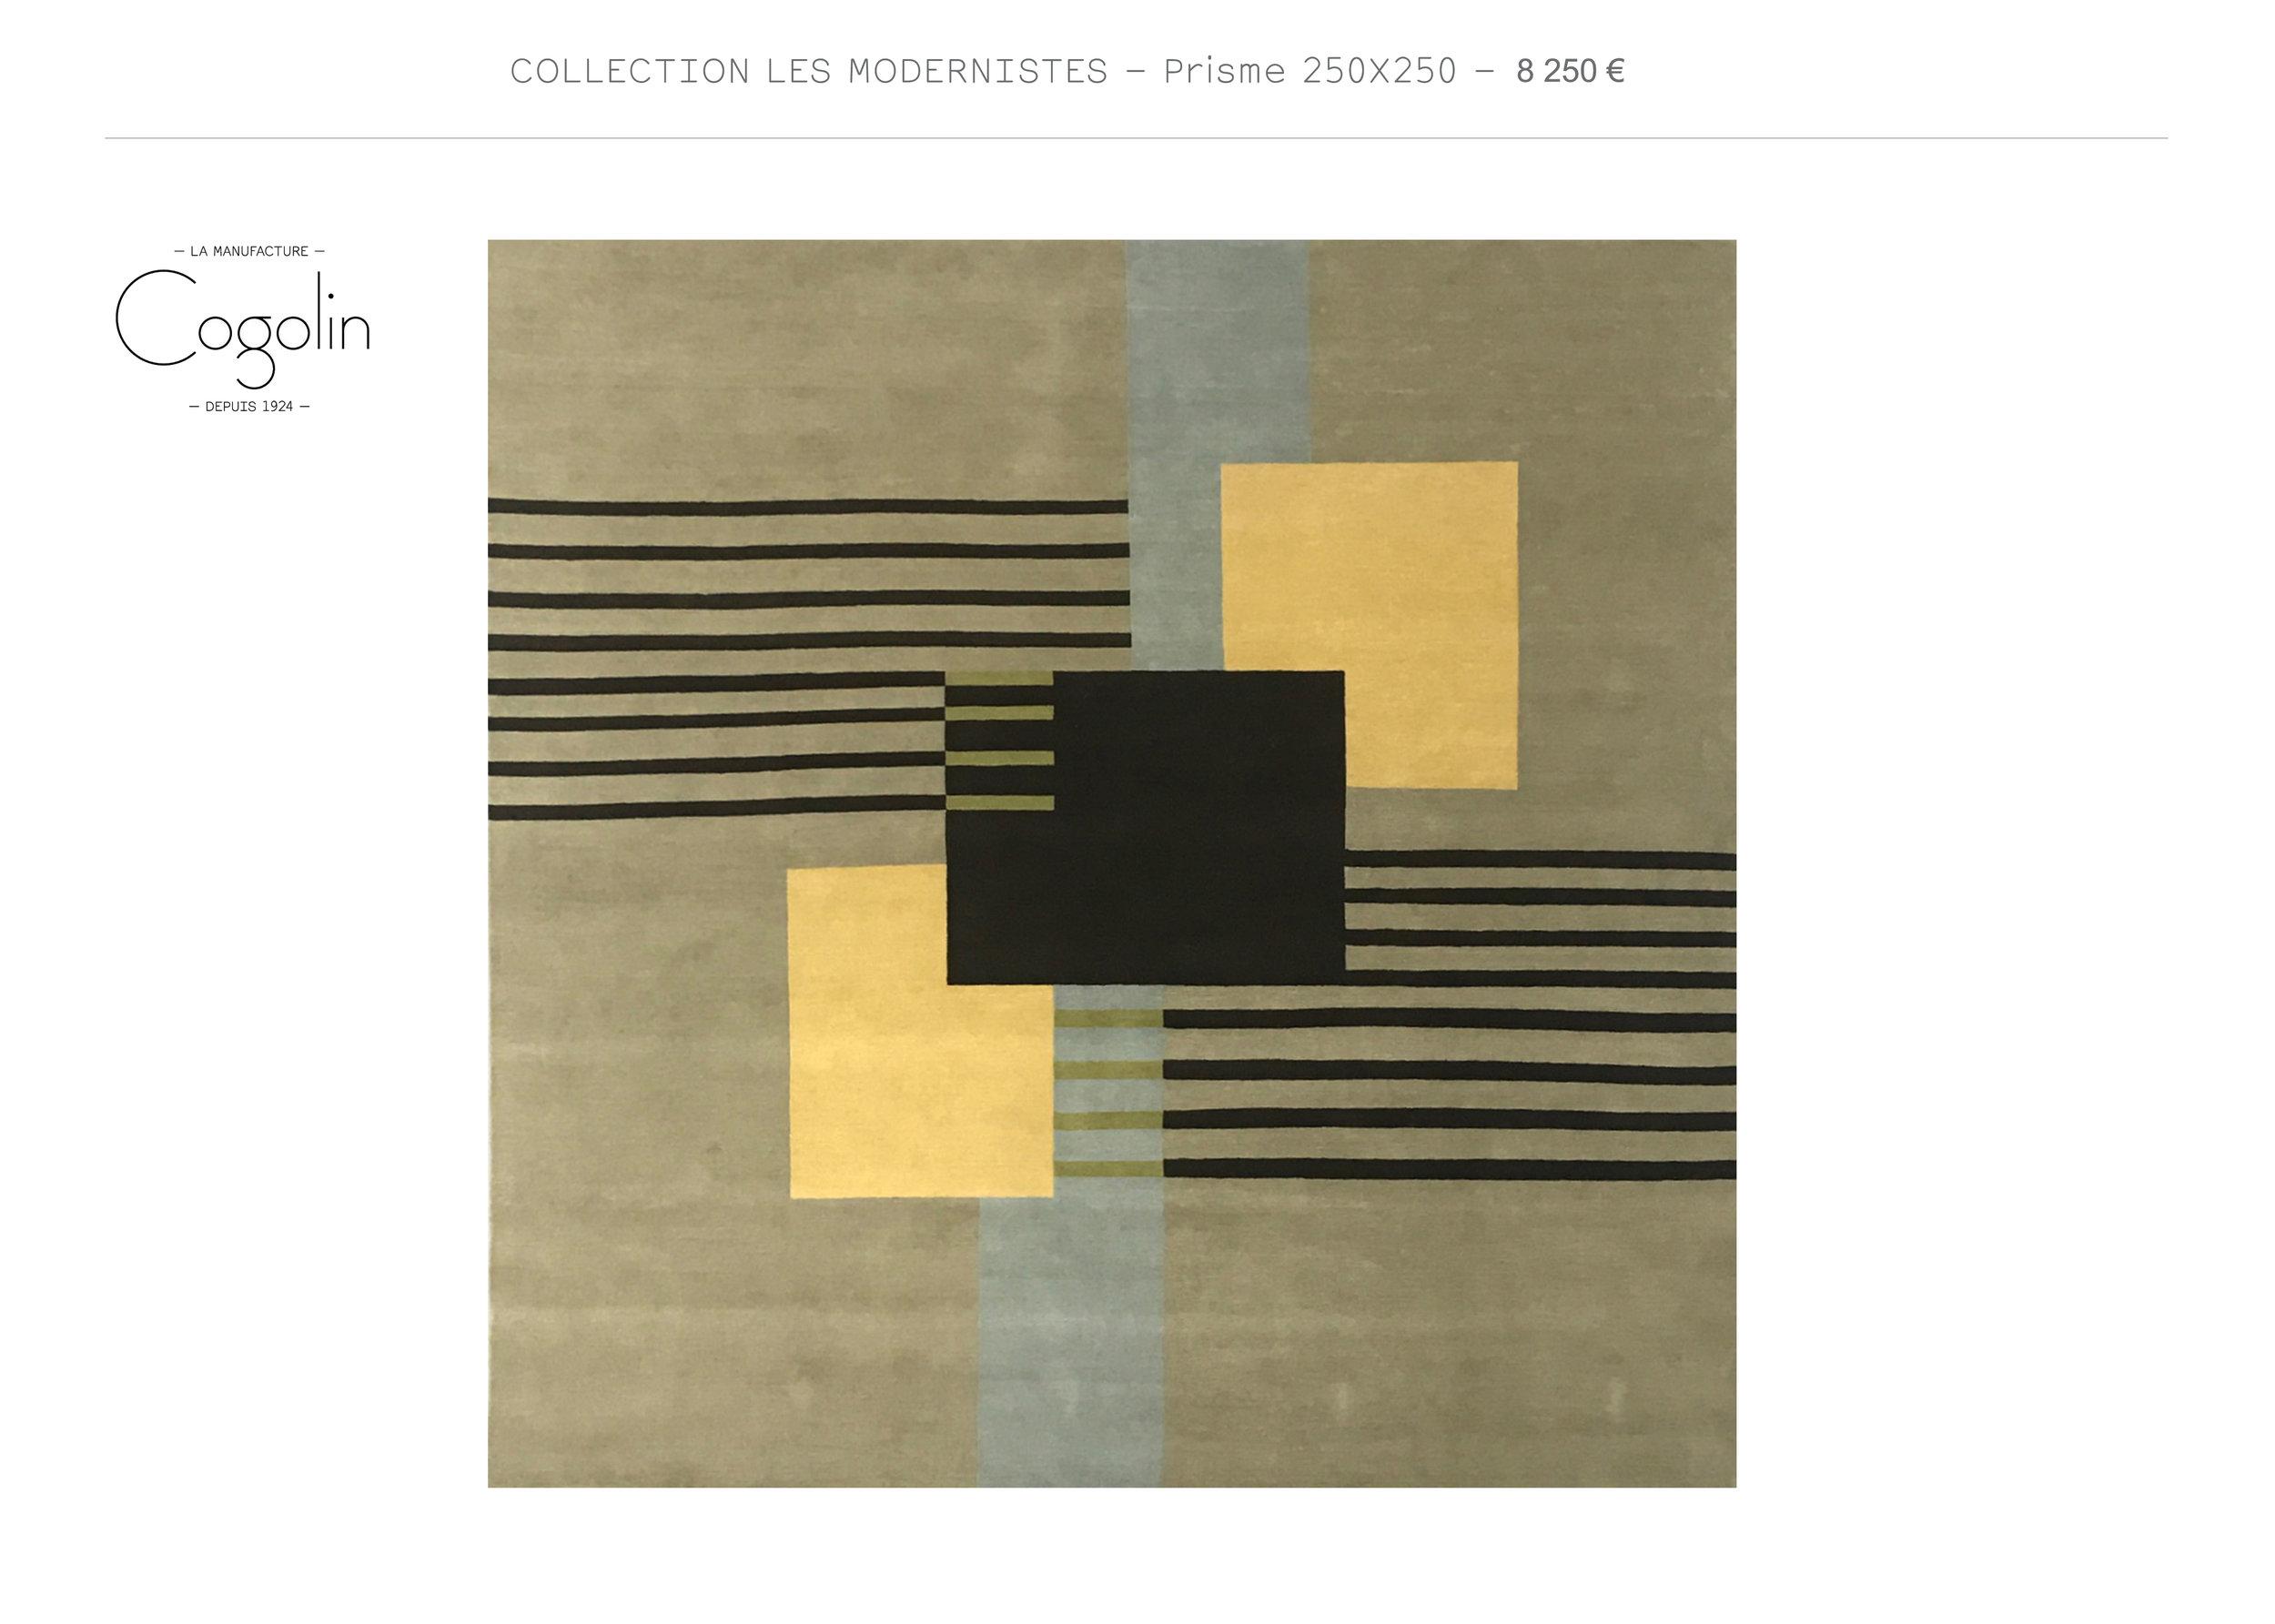 COLLECTION LES MODERNISTES - Prisme 250X250.jpg